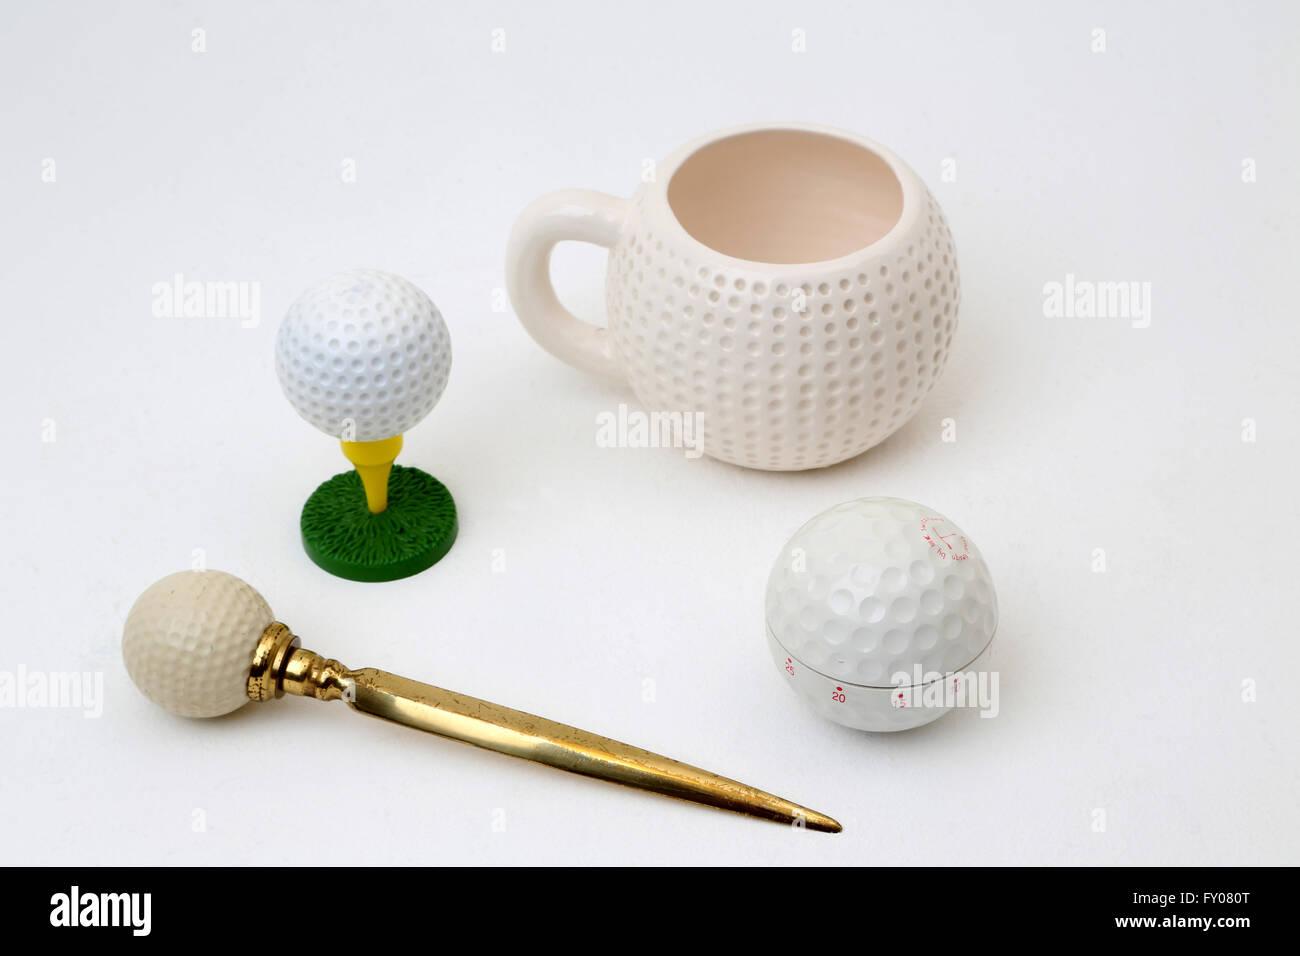 Golf Paraphernalia - Mug, Aftershave, Letter Opener And Cooking Timer - Stock Image